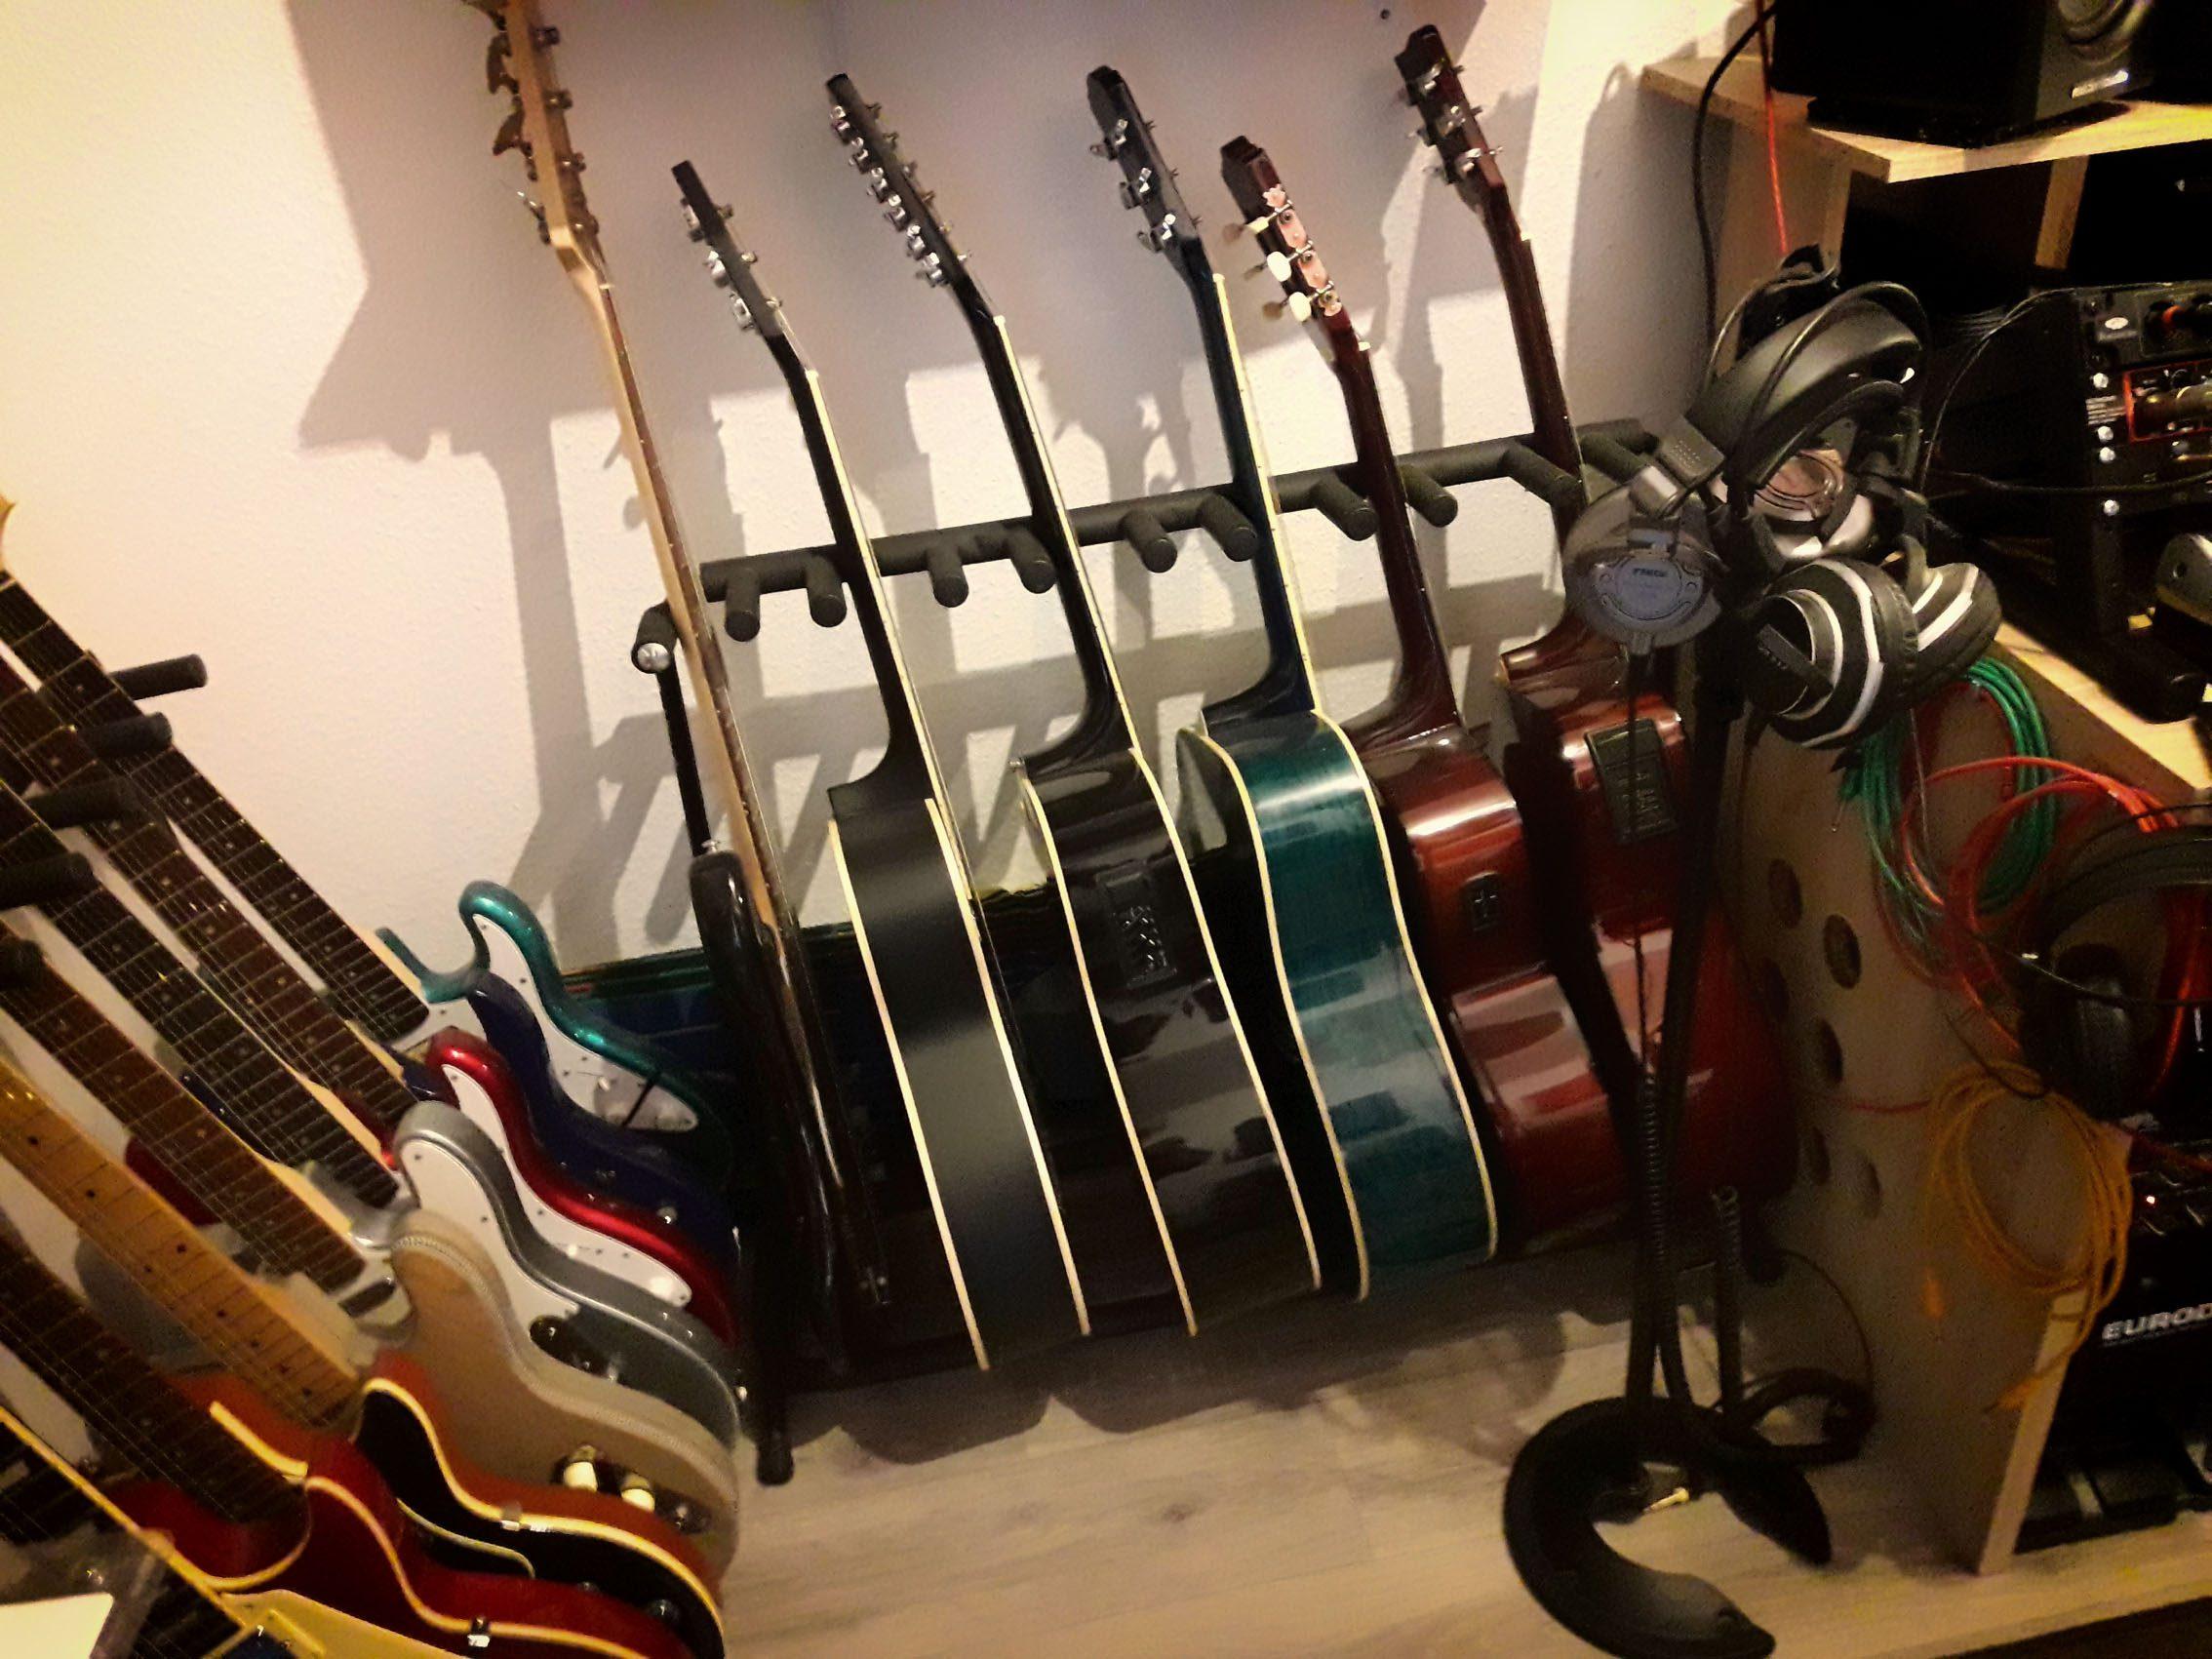 Diverse Gitarren (Godin, Baboushka, Jack and Danny, Squier, Harley Benton)